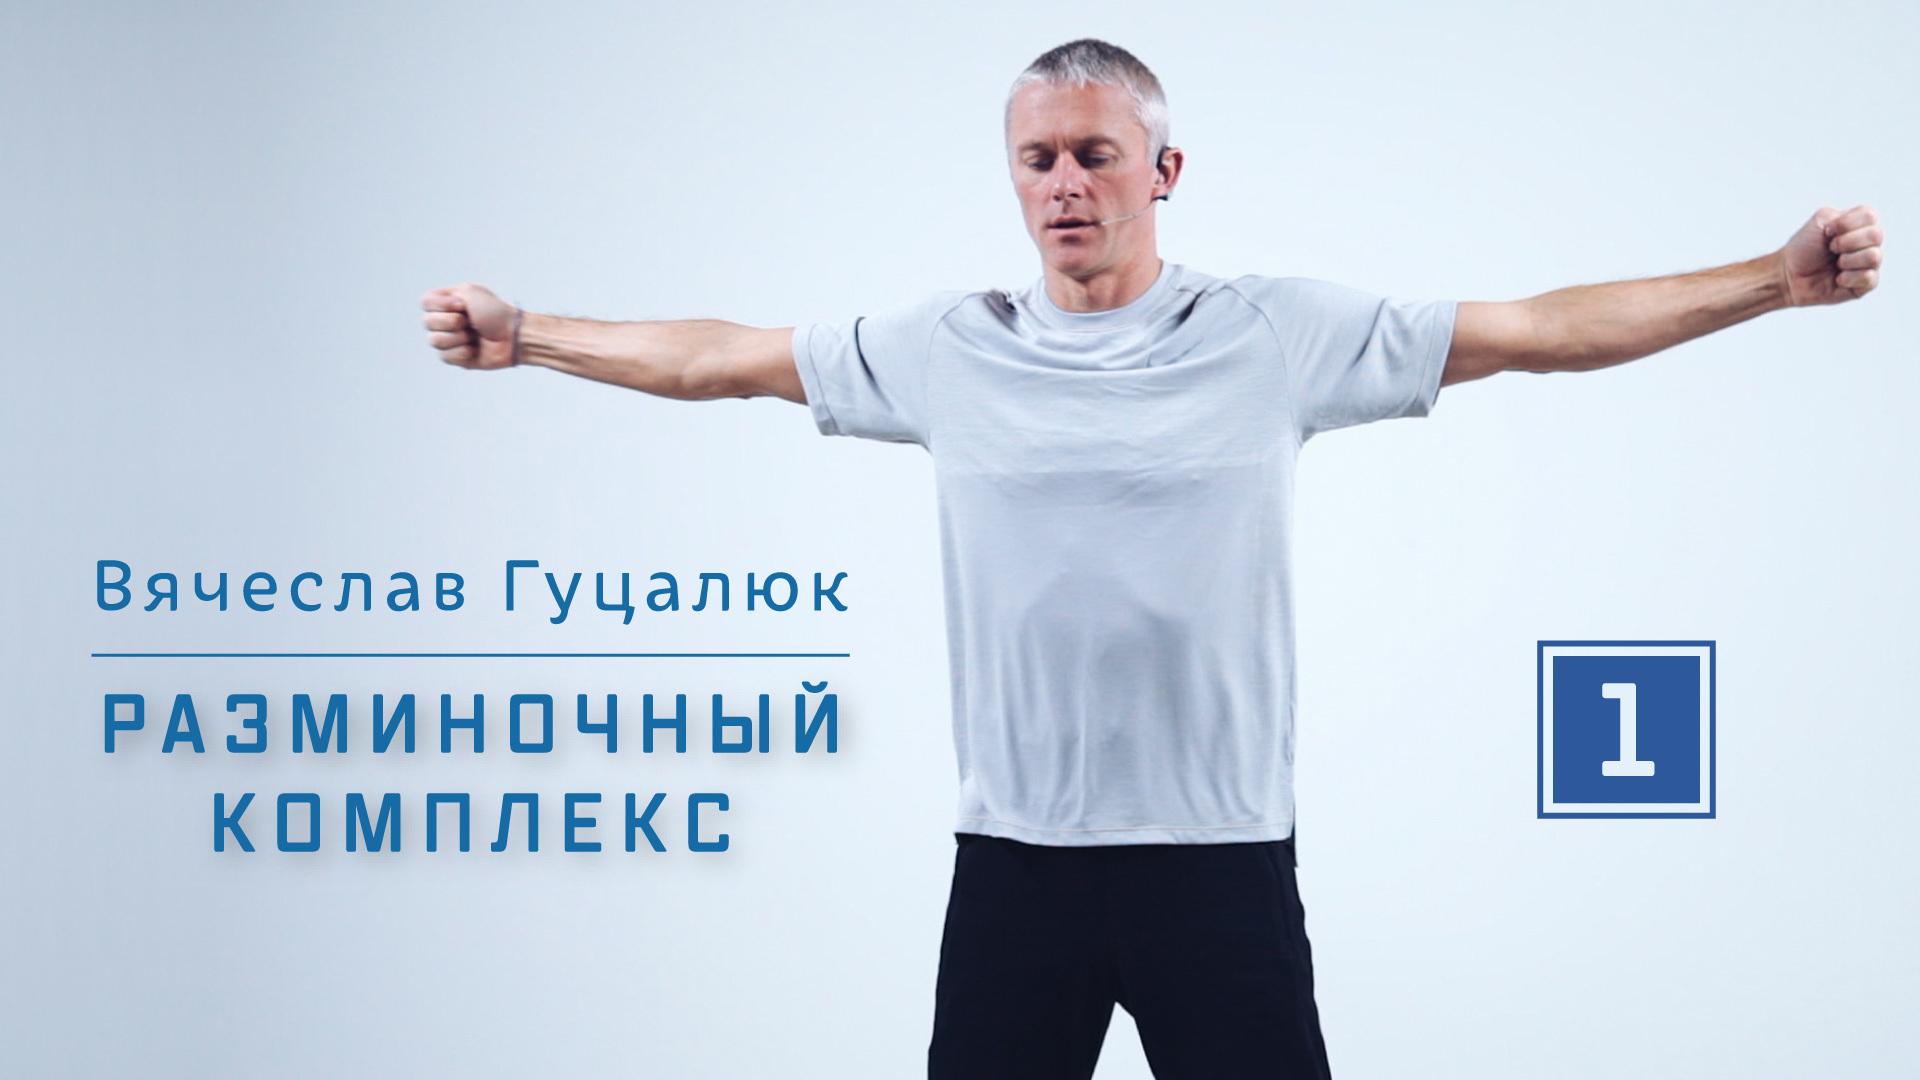 Разминка «Суставная гимнастика»